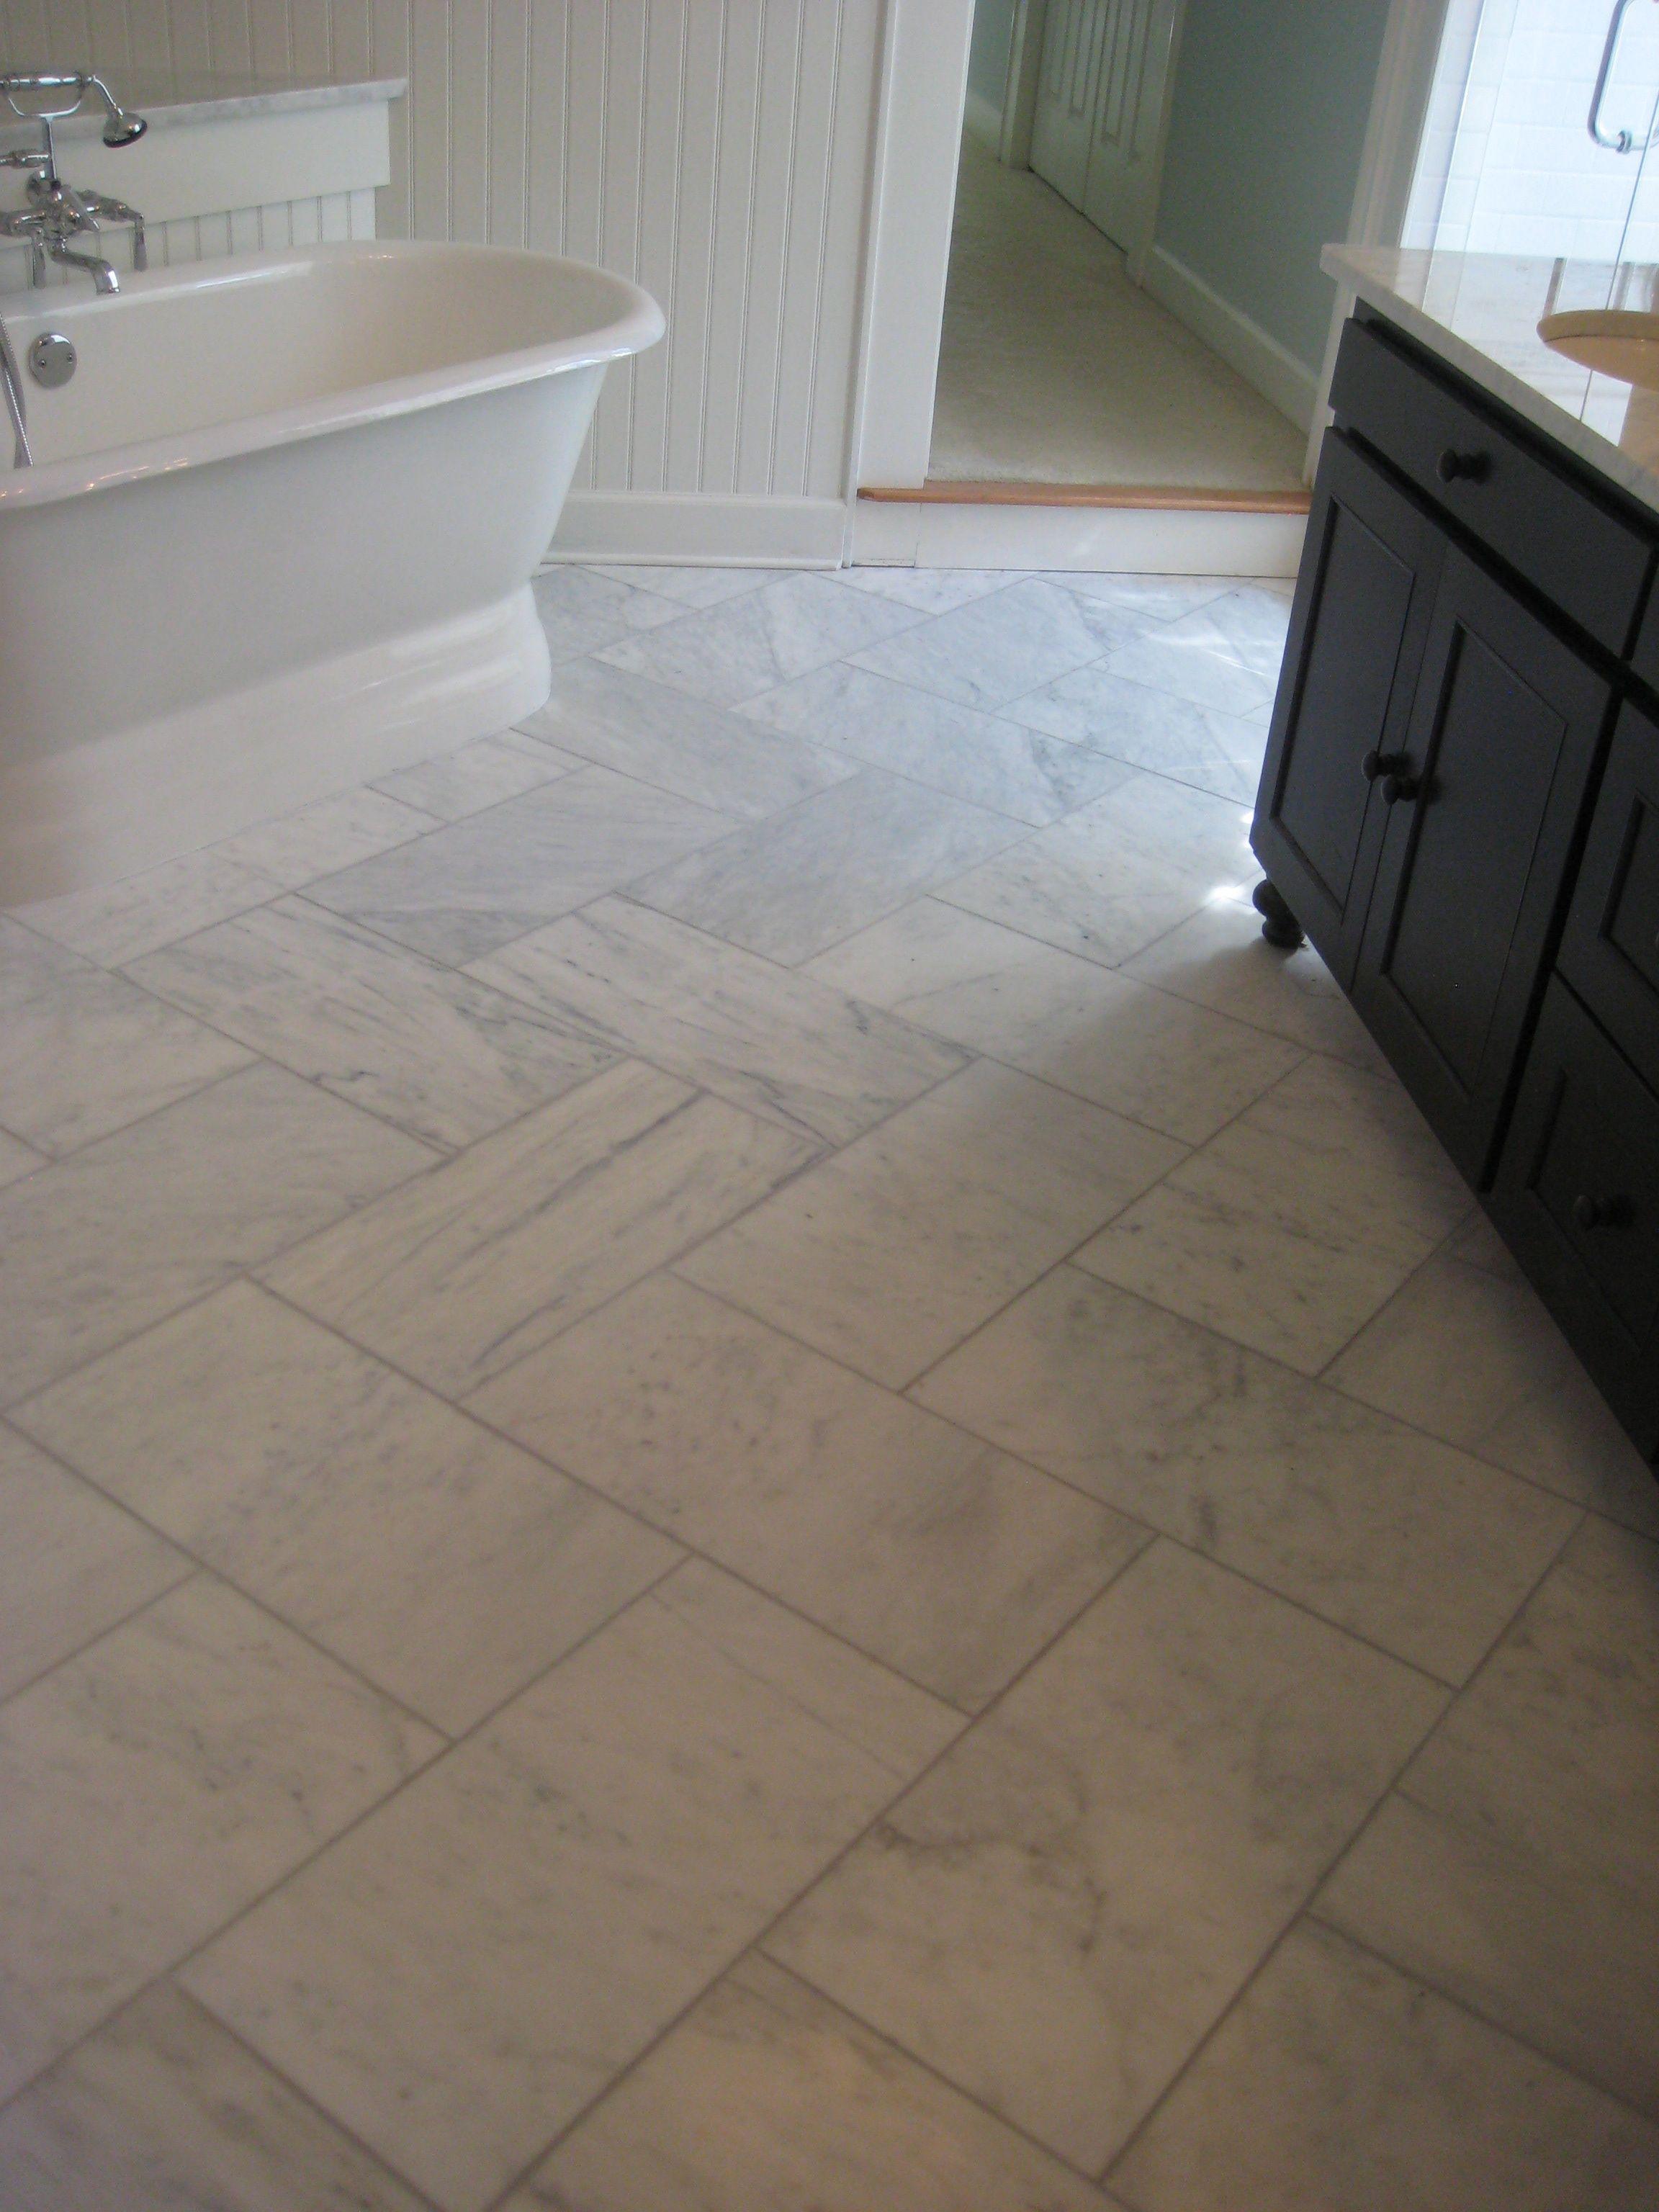 hodge bath after herringbone marble floors bathrooms pinterest rh pinterest com